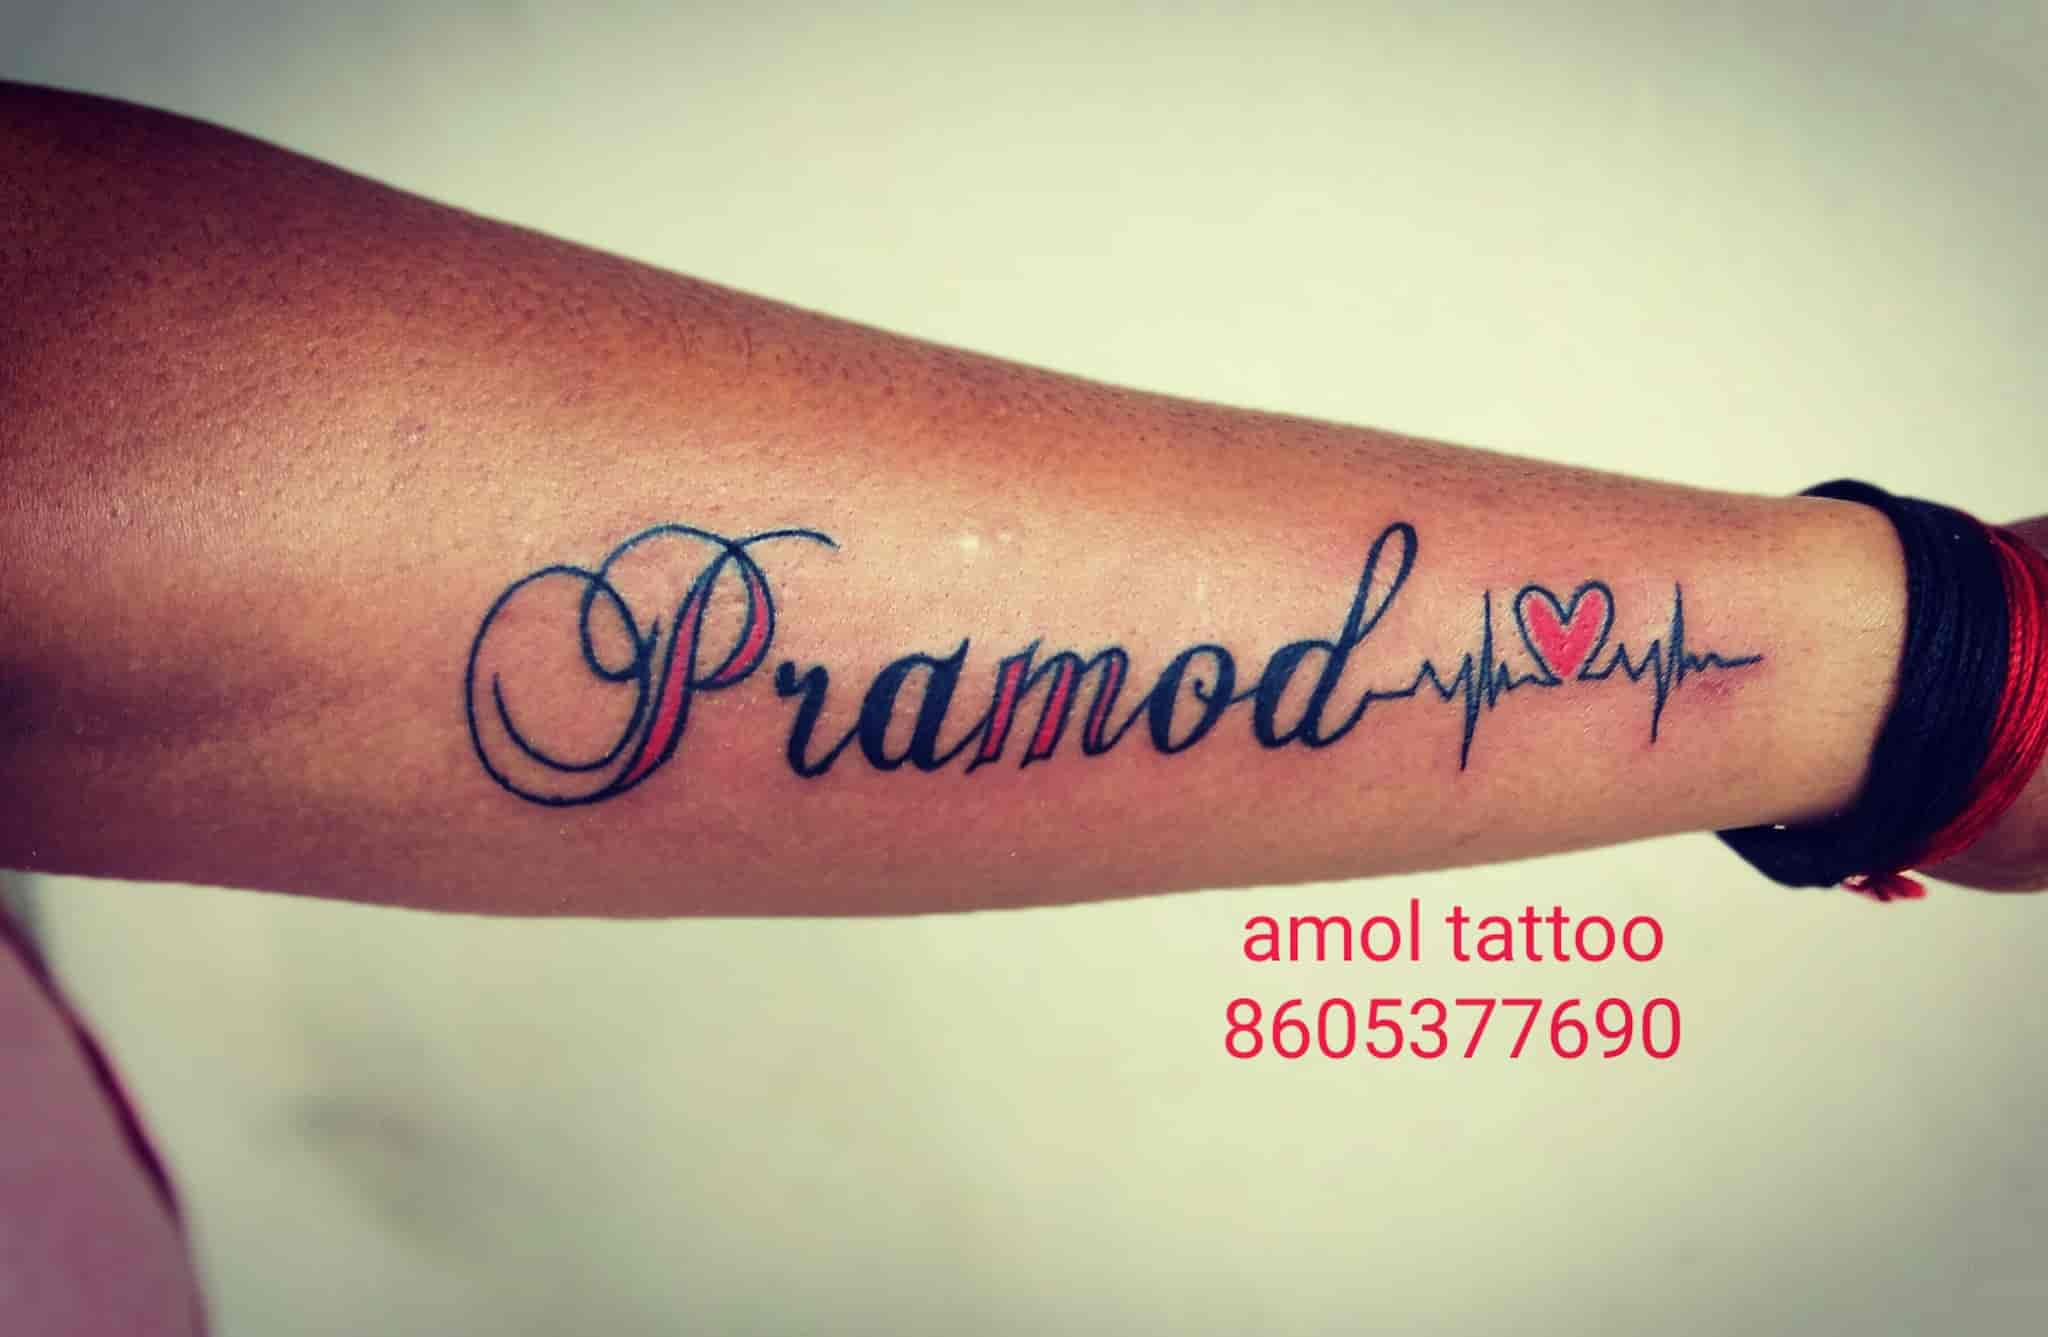 Amol Tatoo Studio, Sangola - Tattoo Artists in Solapur